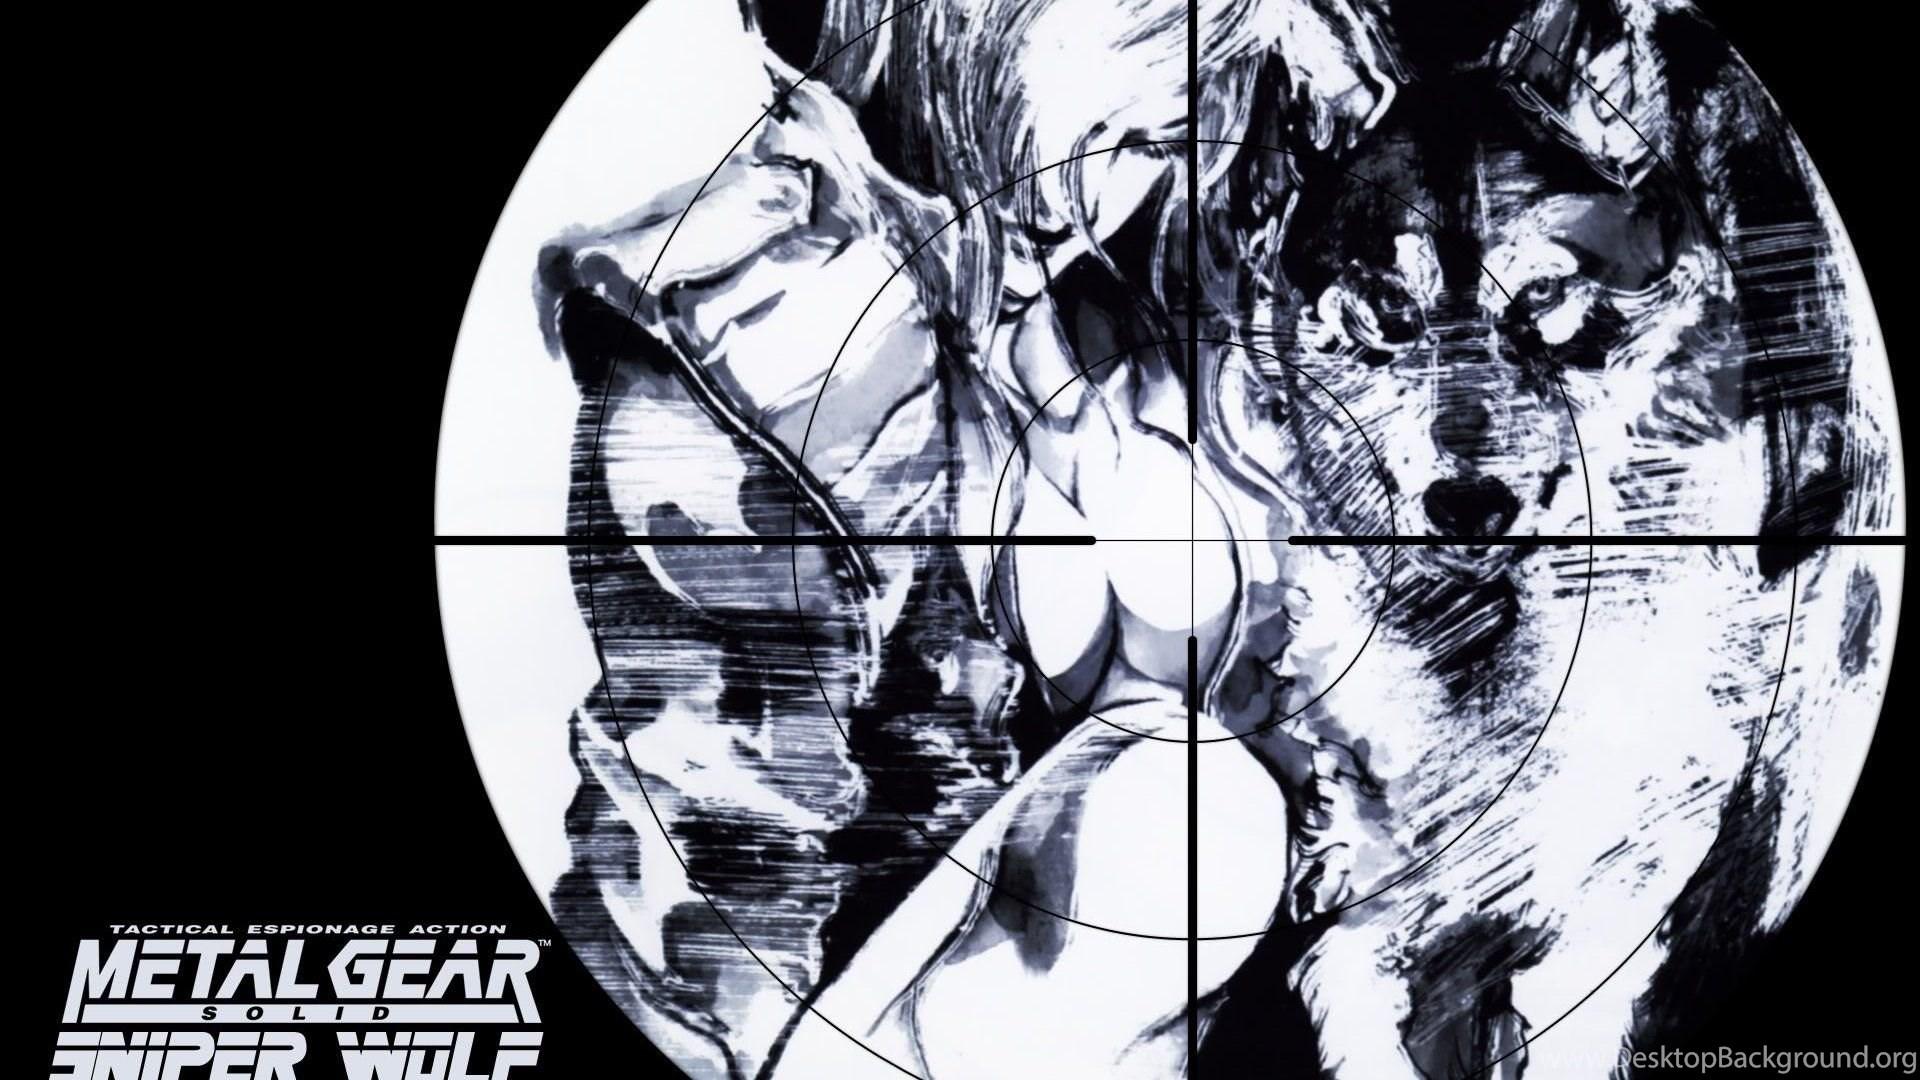 Wallpaper Metal Gear Solid Sniper Wolf Game Wallpapers Desktop